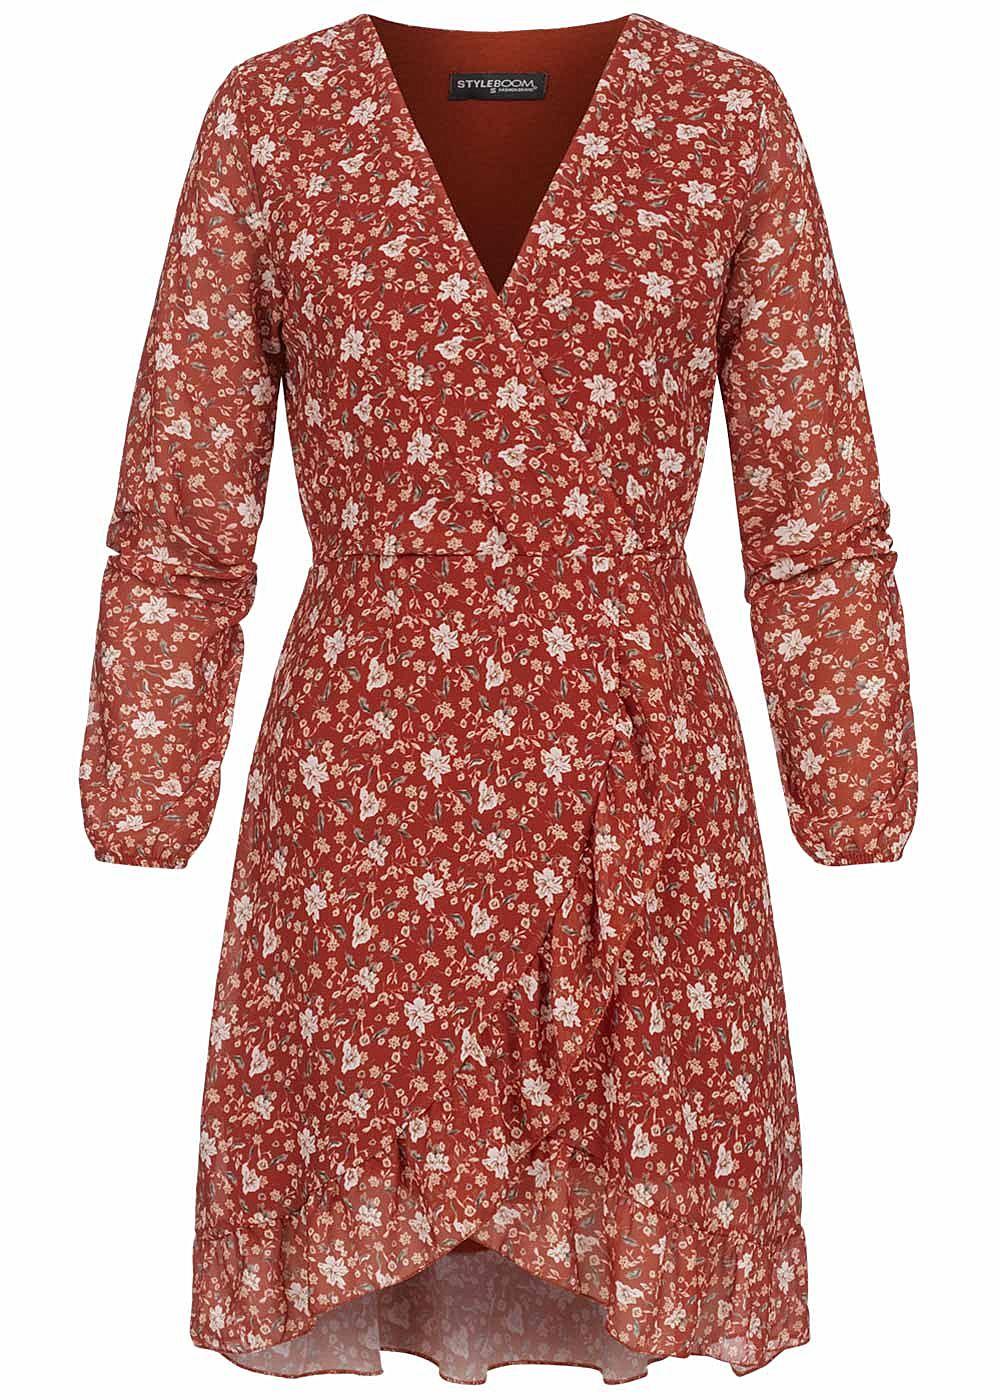 Styleboom Fashion Damen V-Neck Chiffon Kleid Blumen Print Wickel